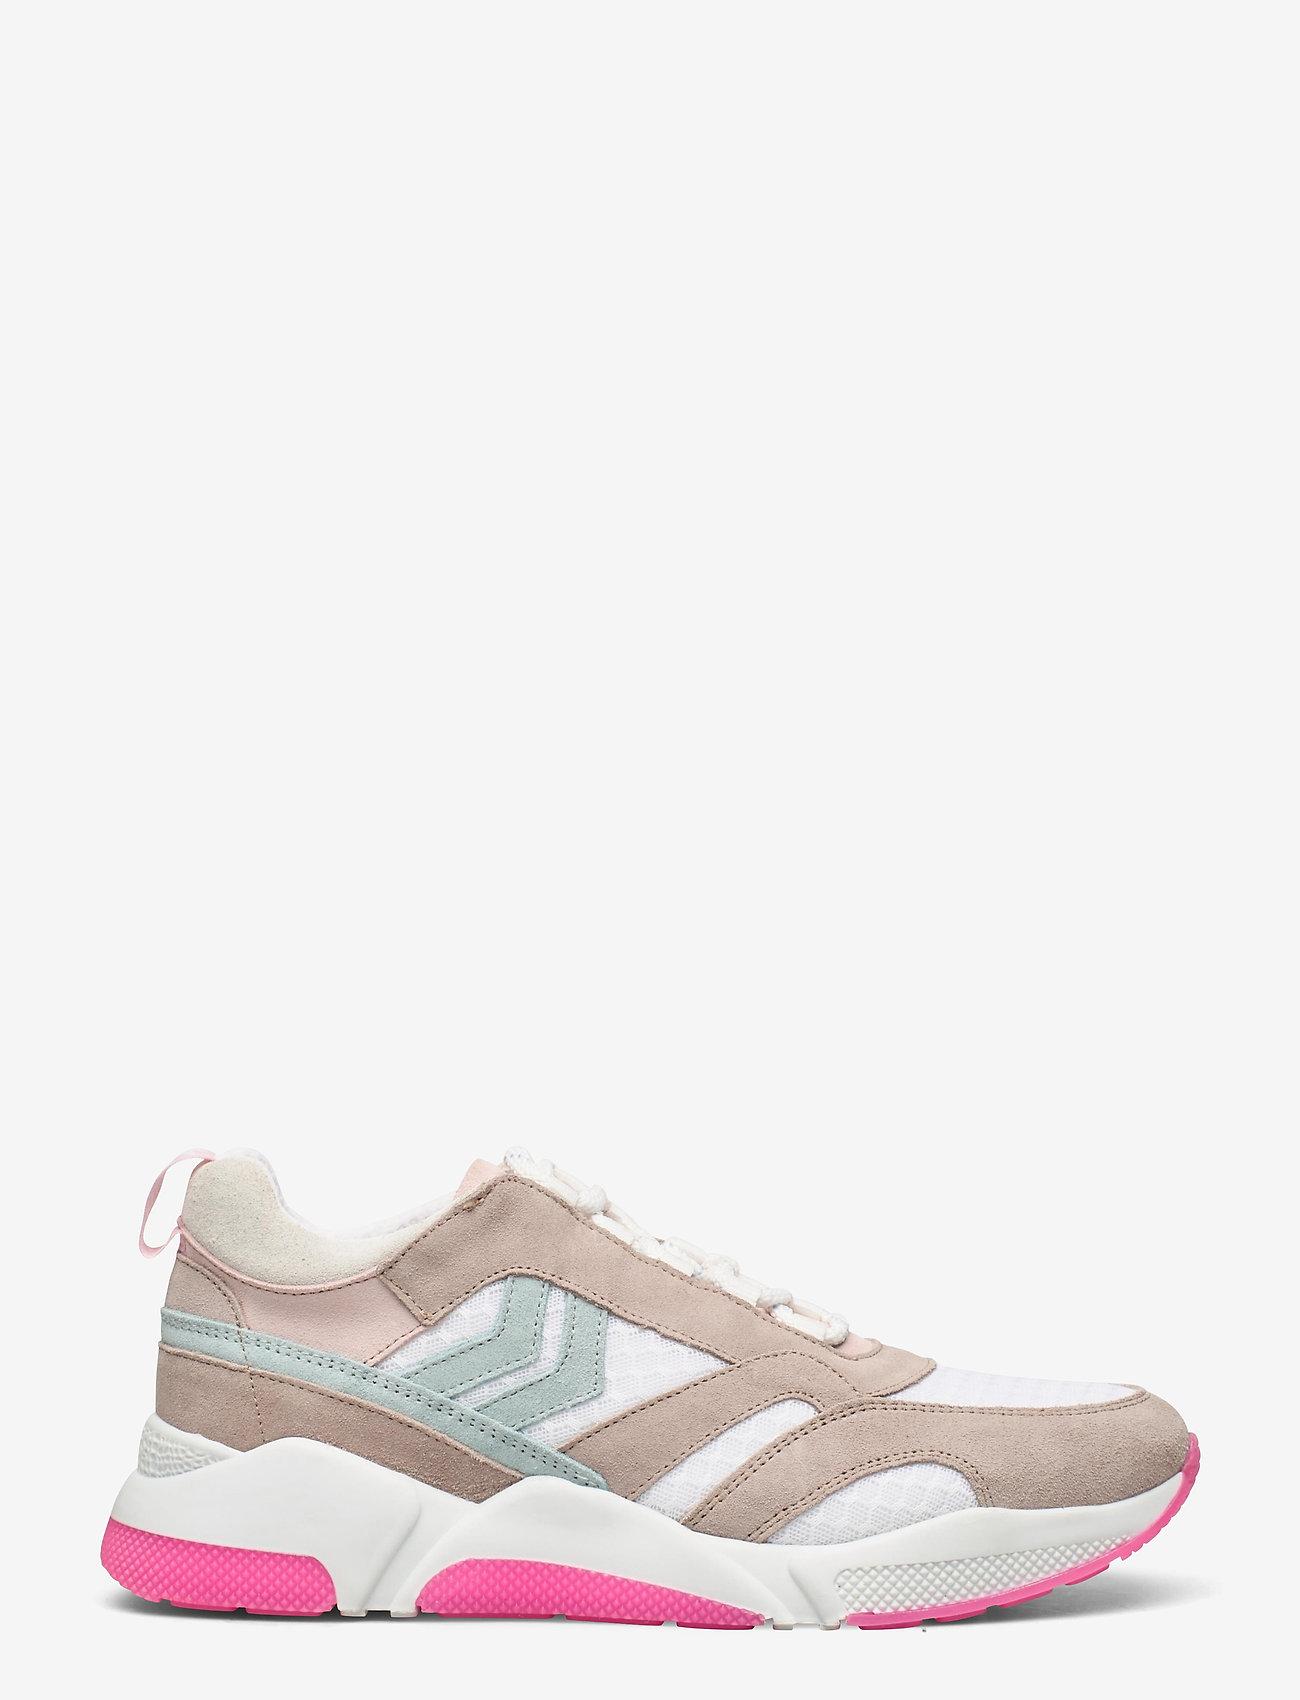 Hummel - ALBERTA - laag sneakers - white sand - 0